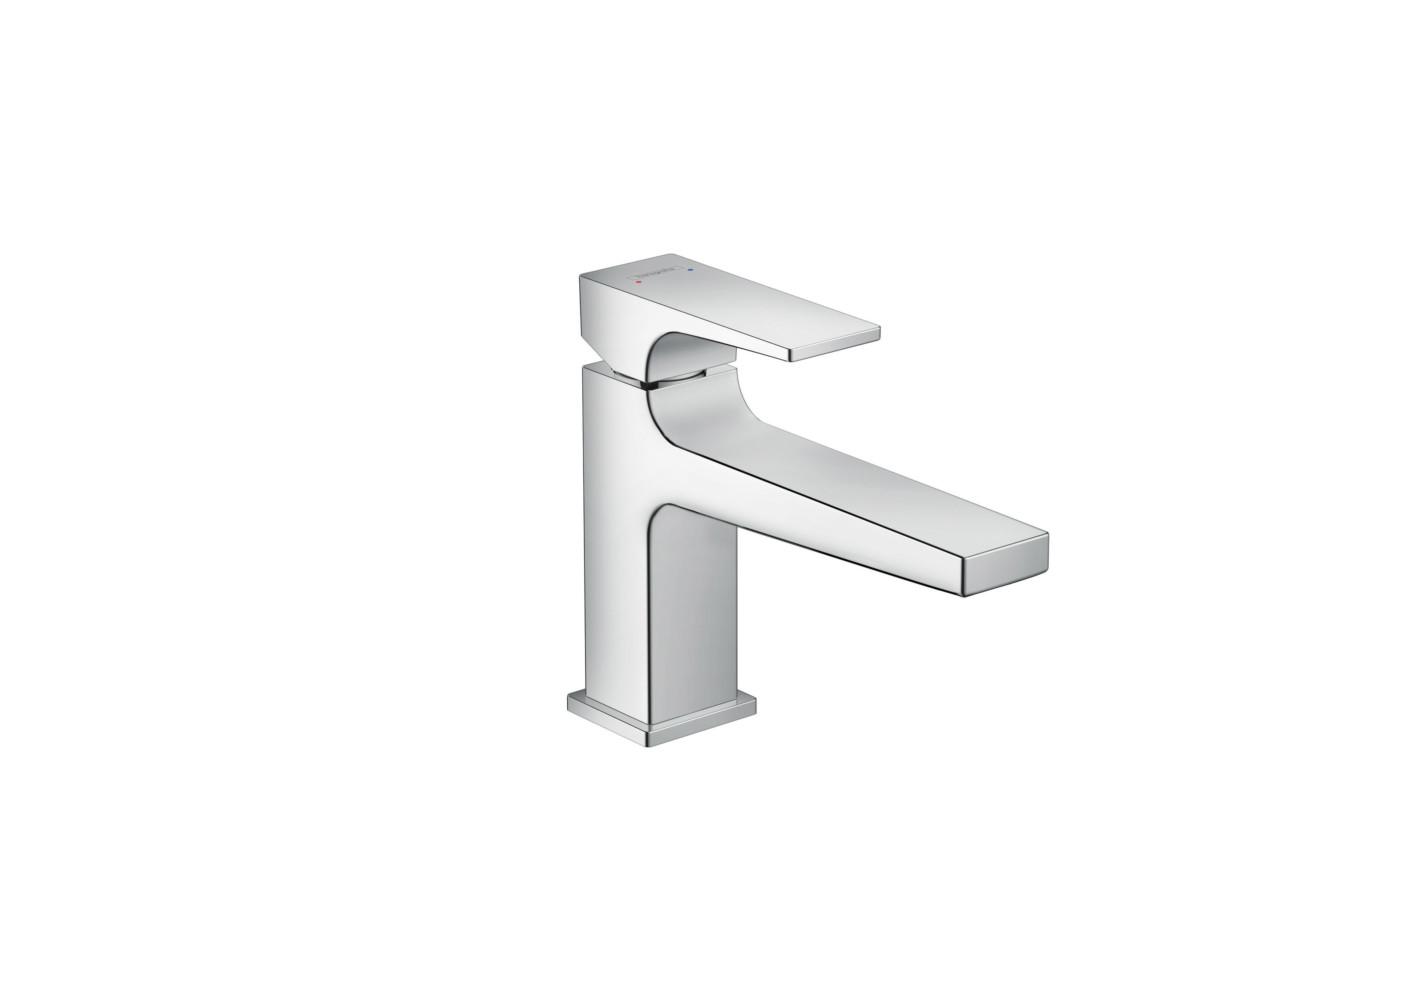 Metropol single lever washbasin mixer 100 long by Hansgrohe | STYLEPARK